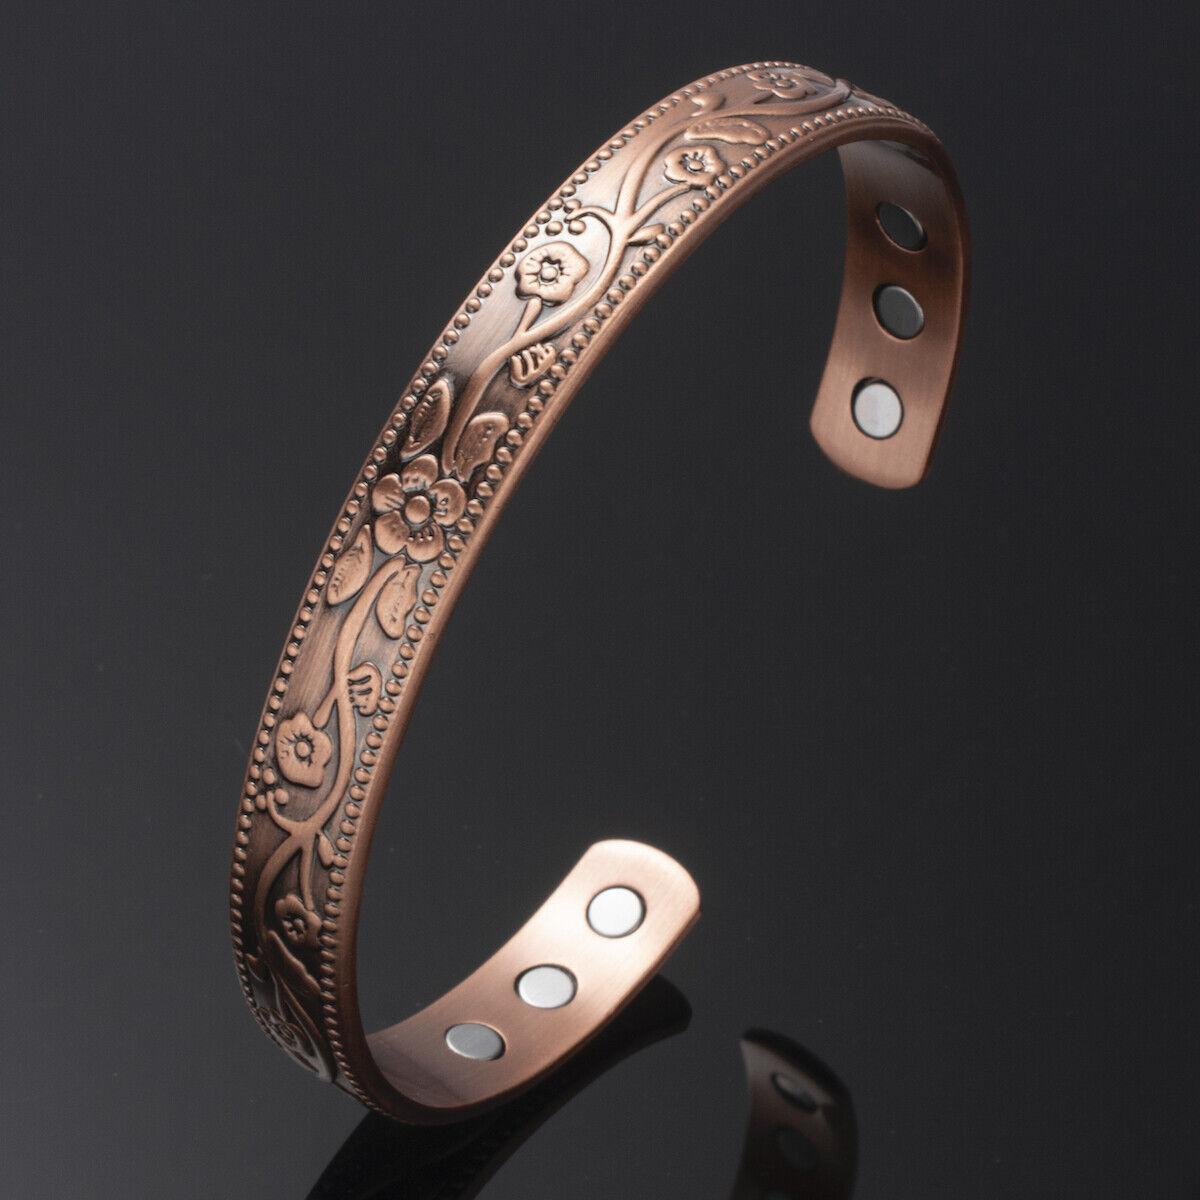 Damen Armreif Kupfer Magnetarmband Natürliche Therapie Armspange 15-18cm